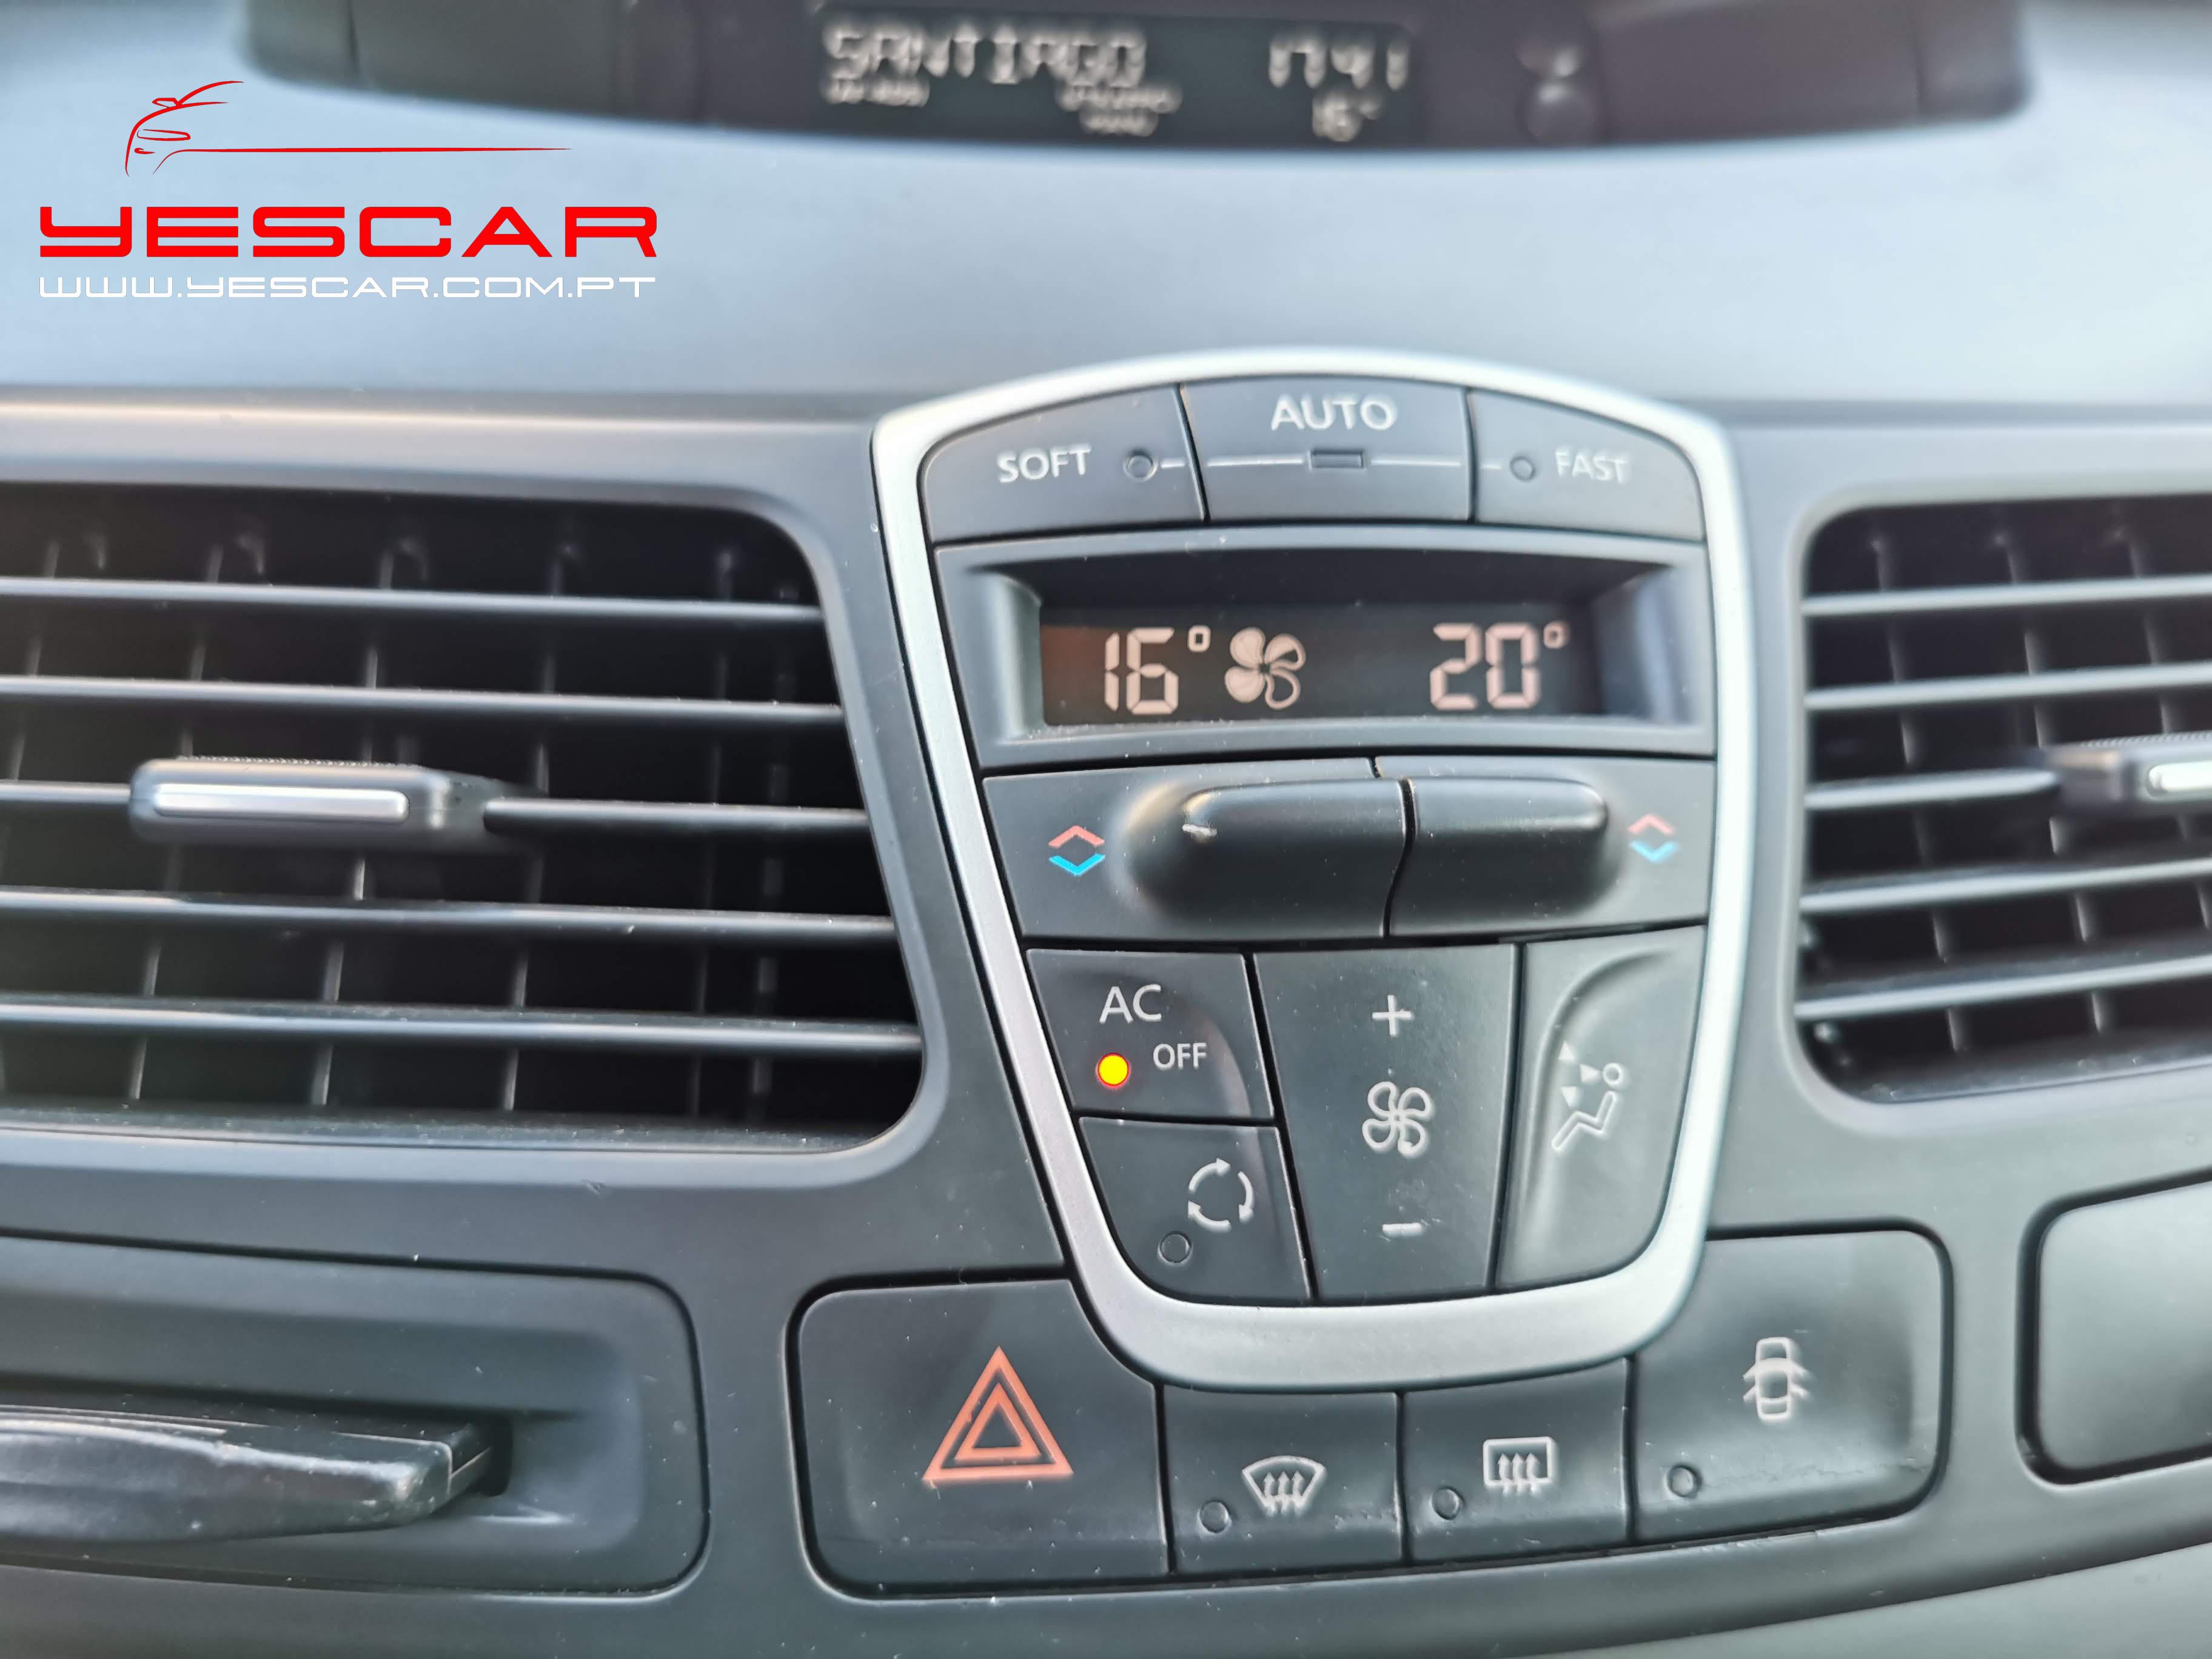 YESCAR_Renault Laguna SW (17)